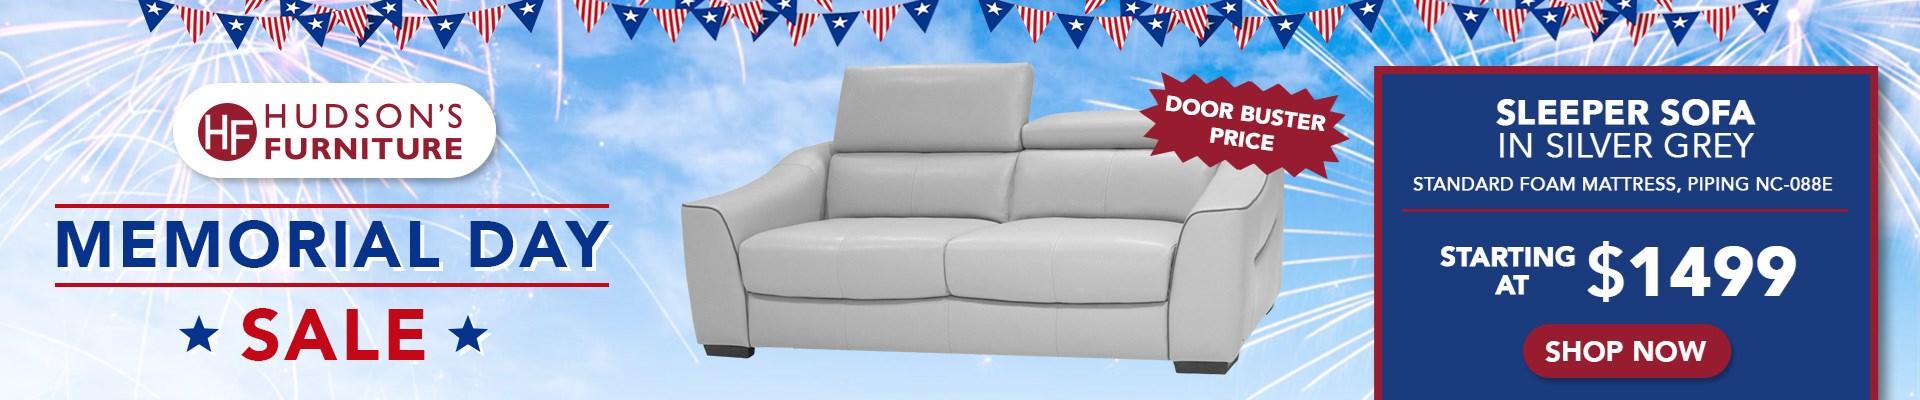 Sleeper Sofa Sale Hudson's Furniture Memorial Day Savings